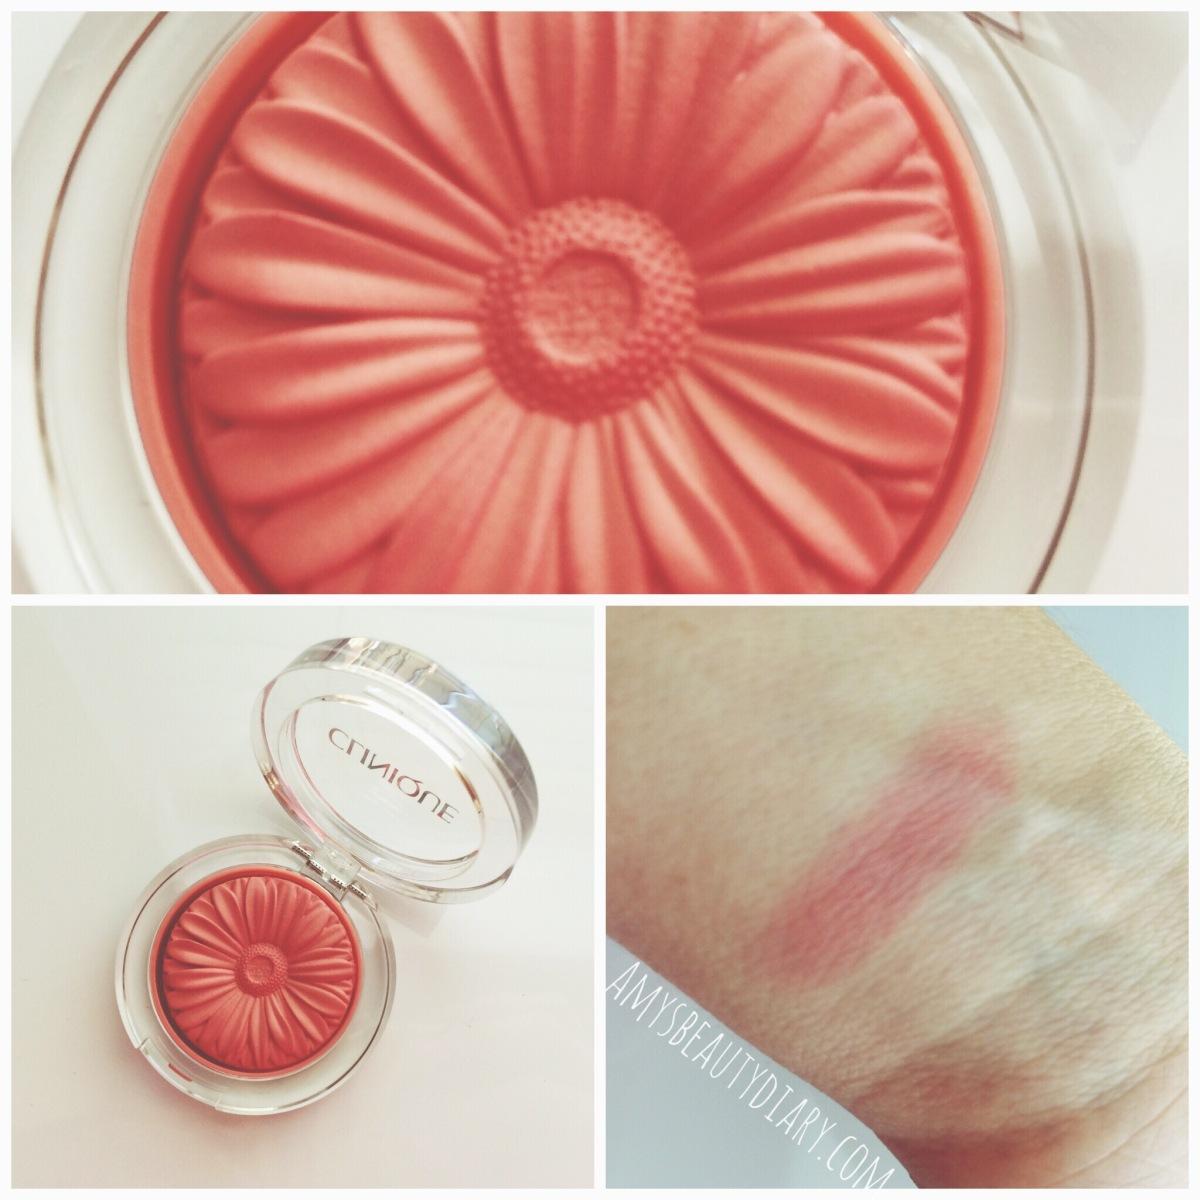 A Natural Flush : Clinique's Rosy PopBlush